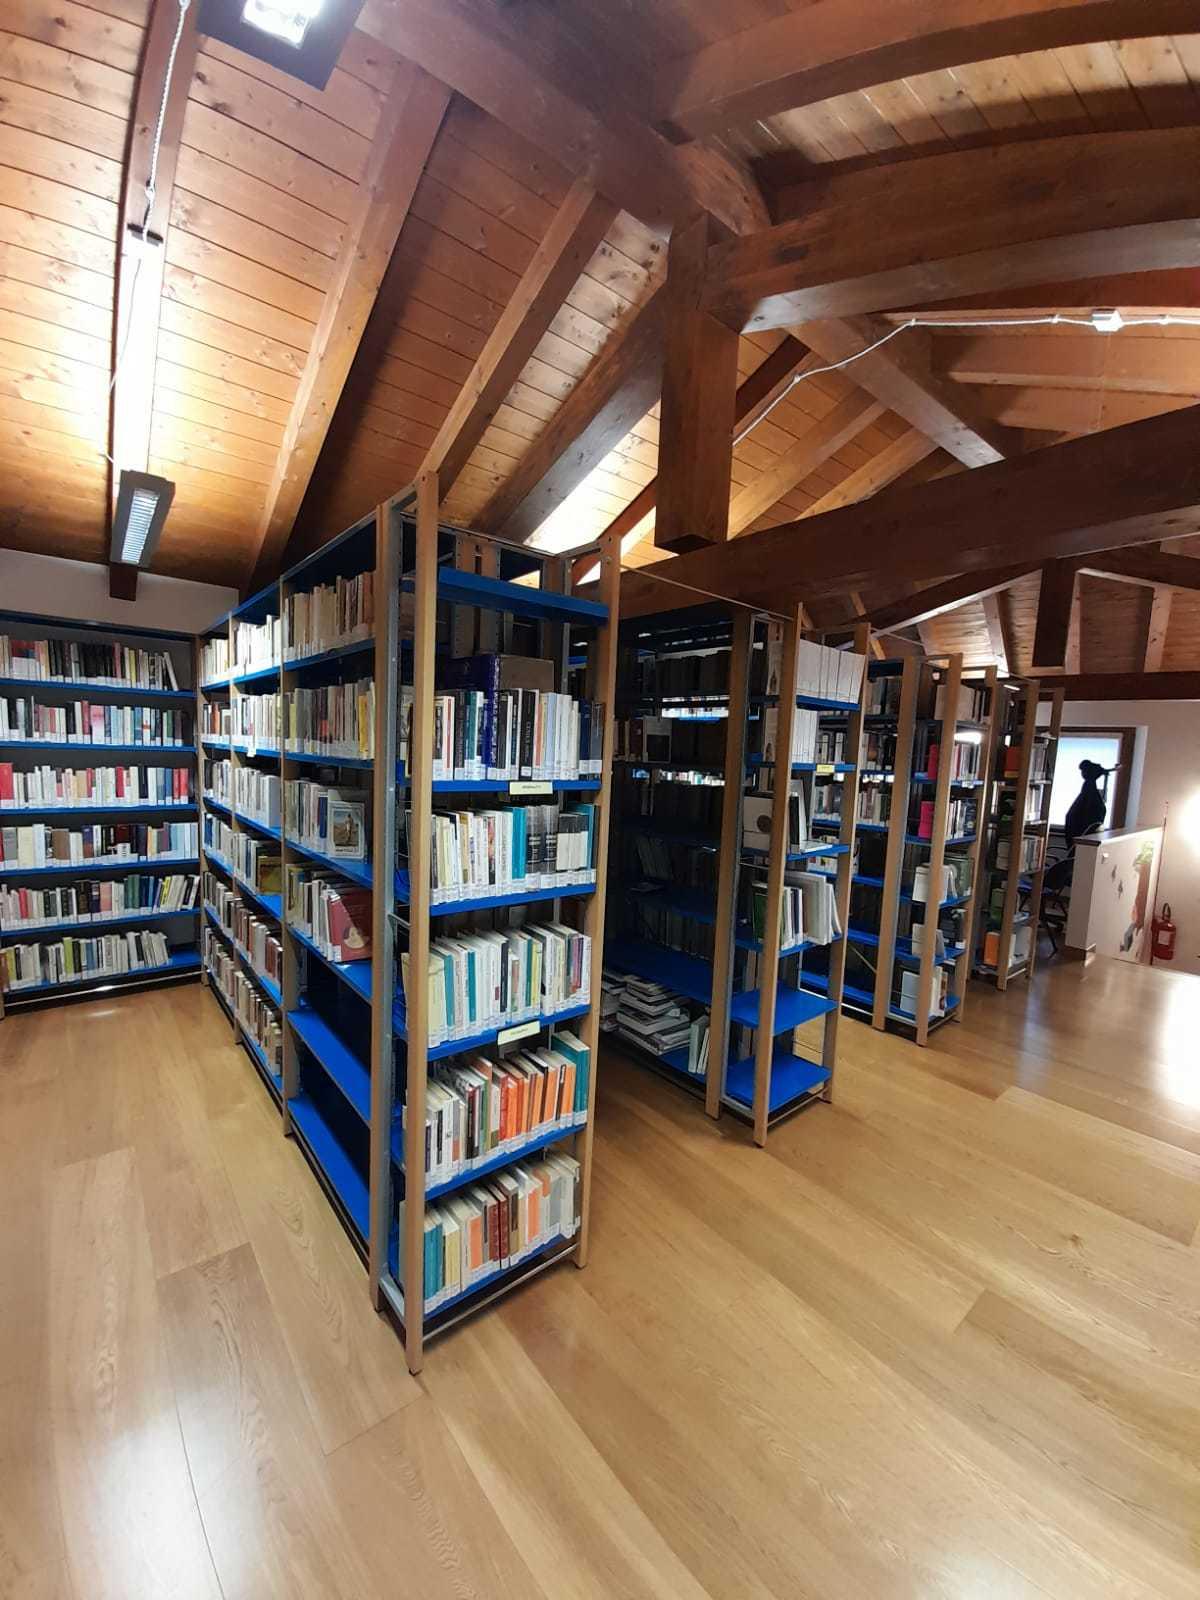 La biblioteca di Trivignano Udinese